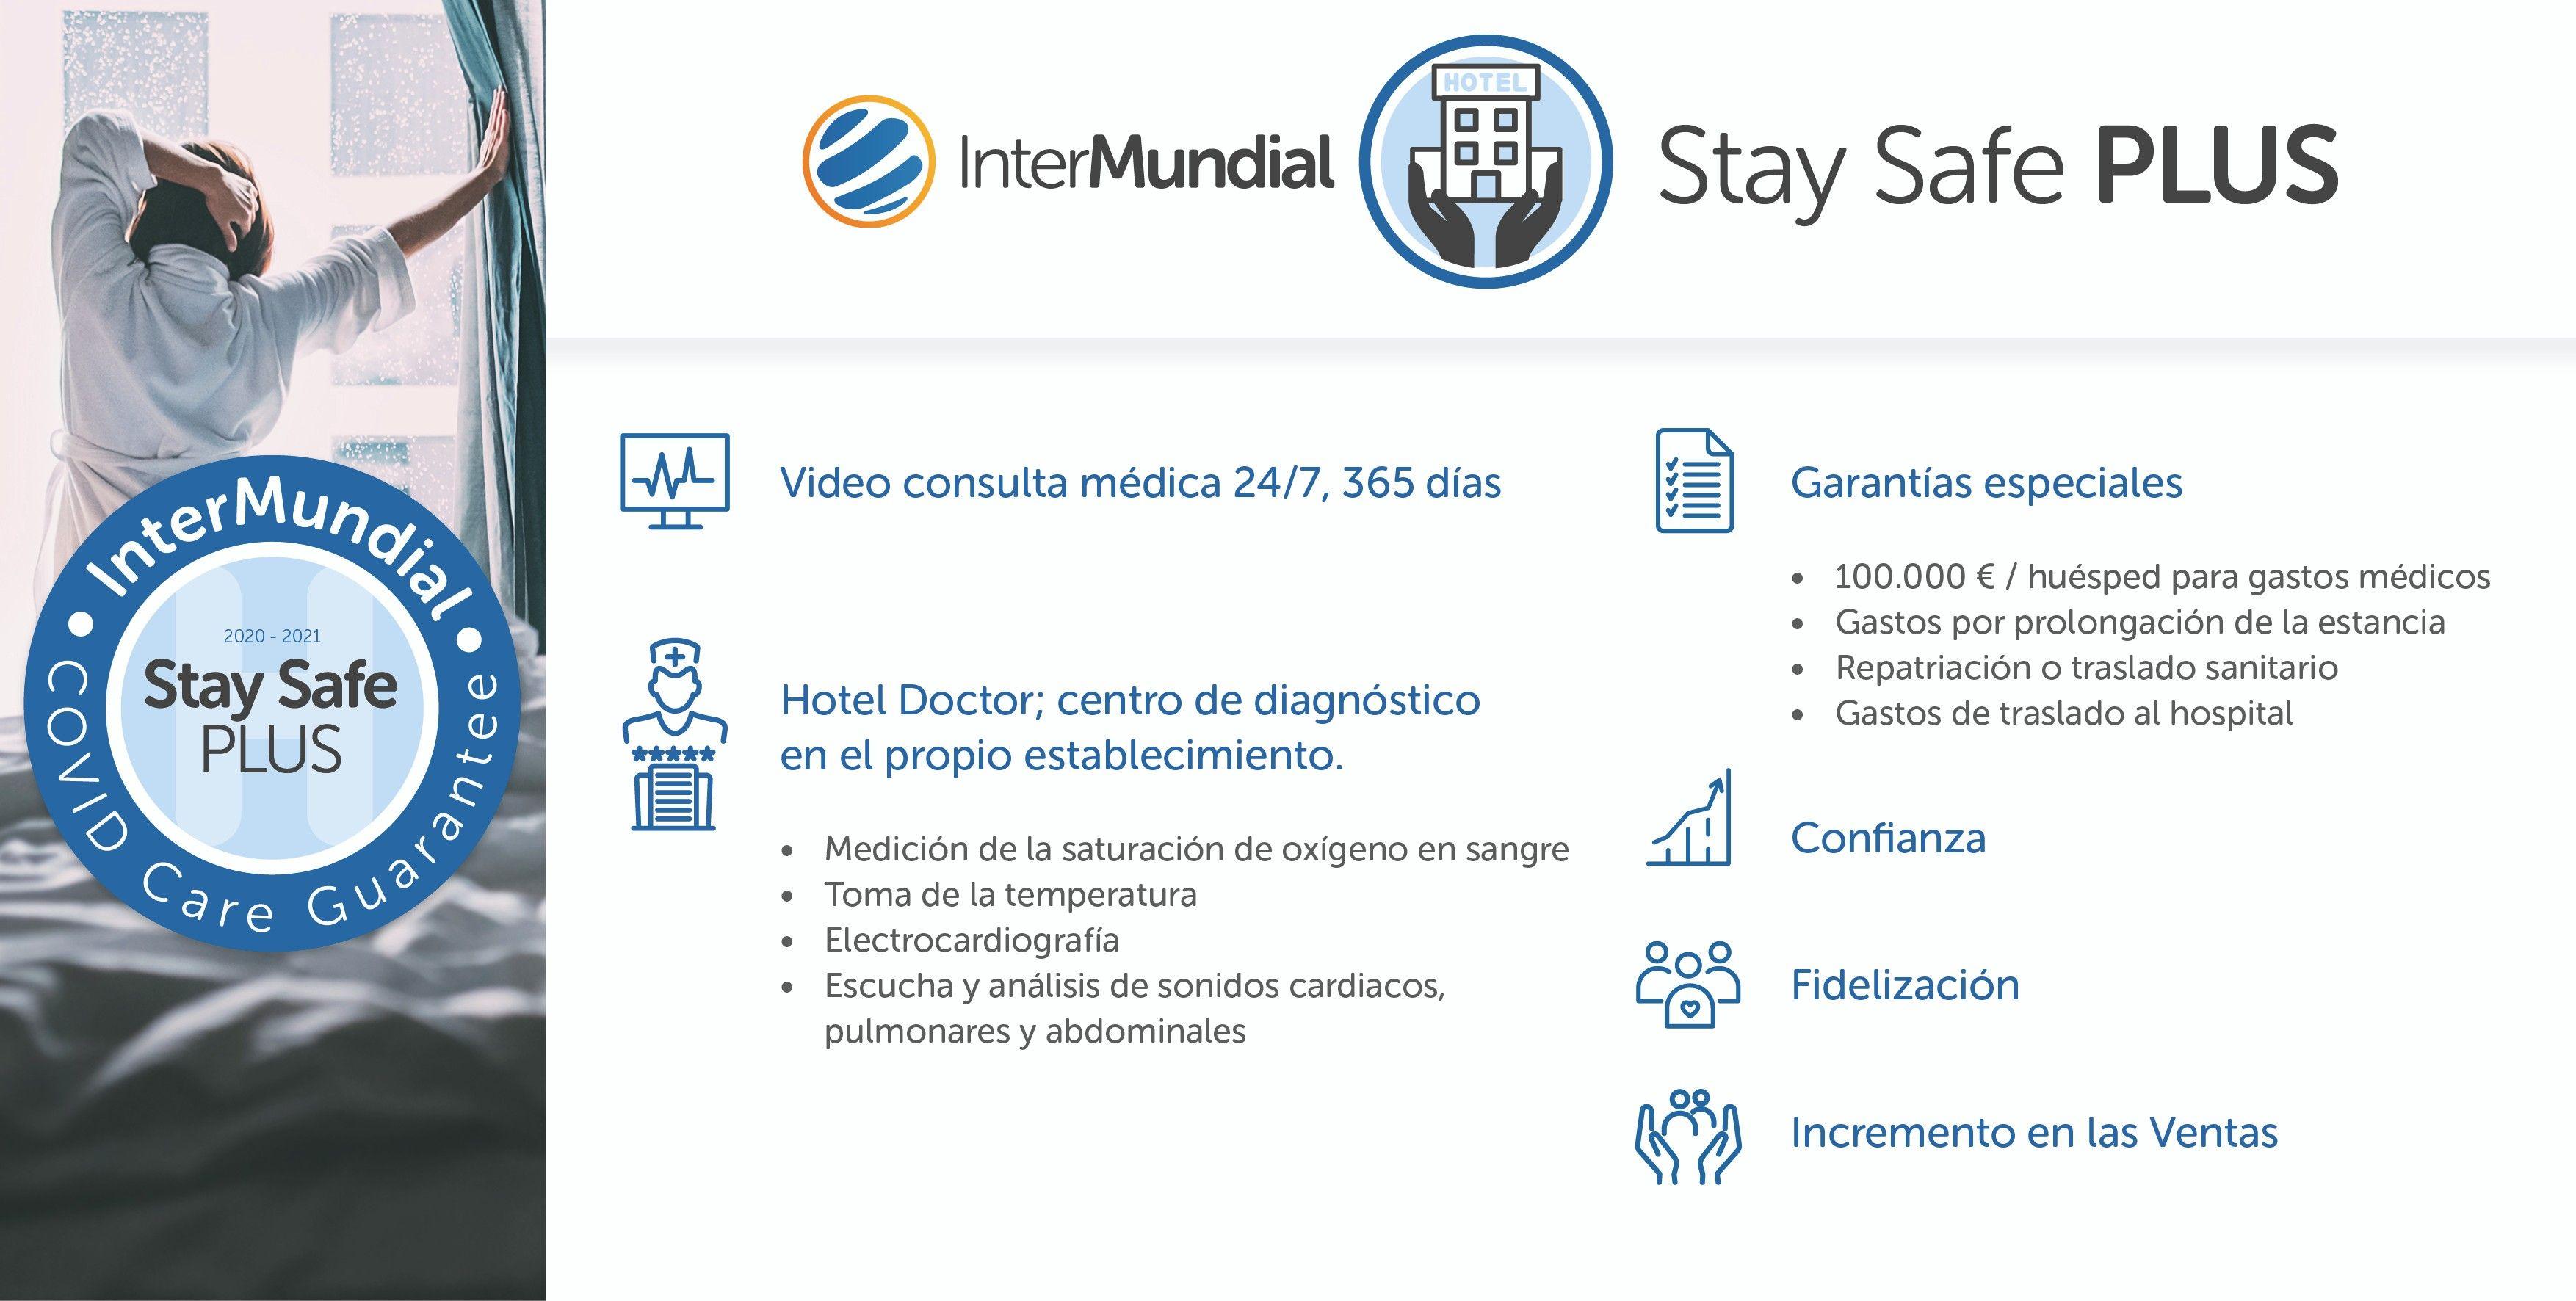 Stay Safe de InterMundial